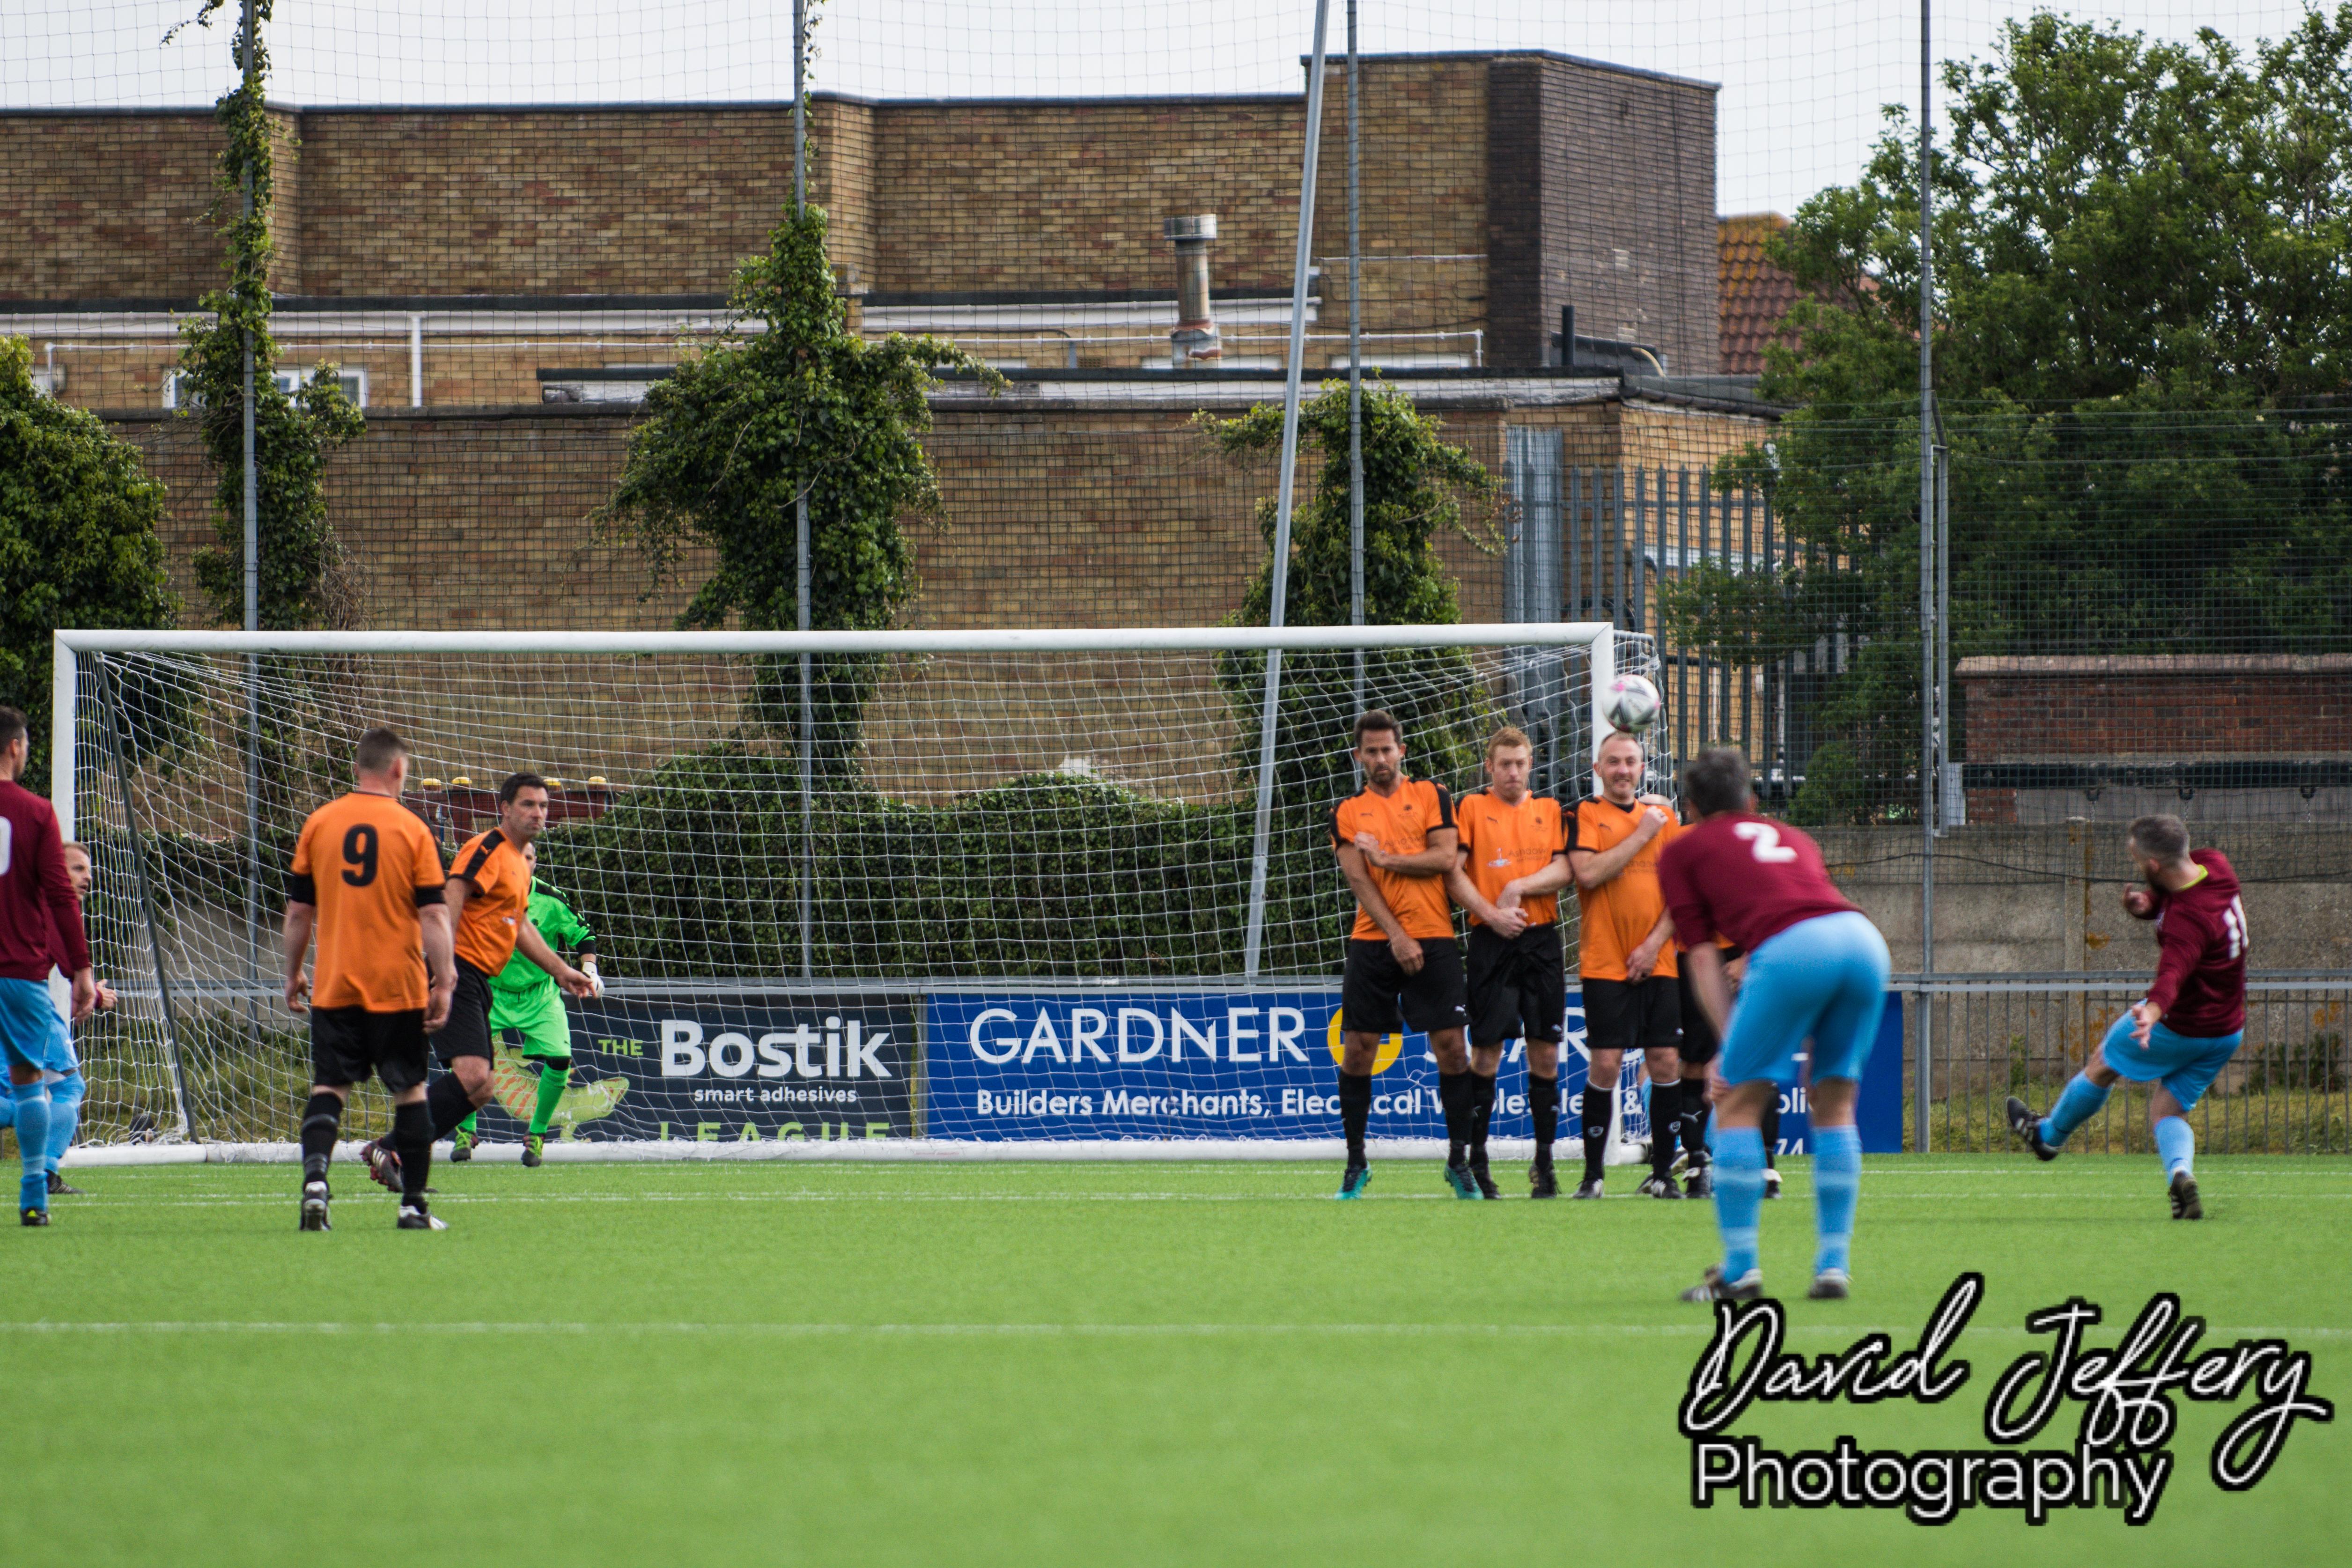 027 MOFC Vets vs Horl Vets 05.05